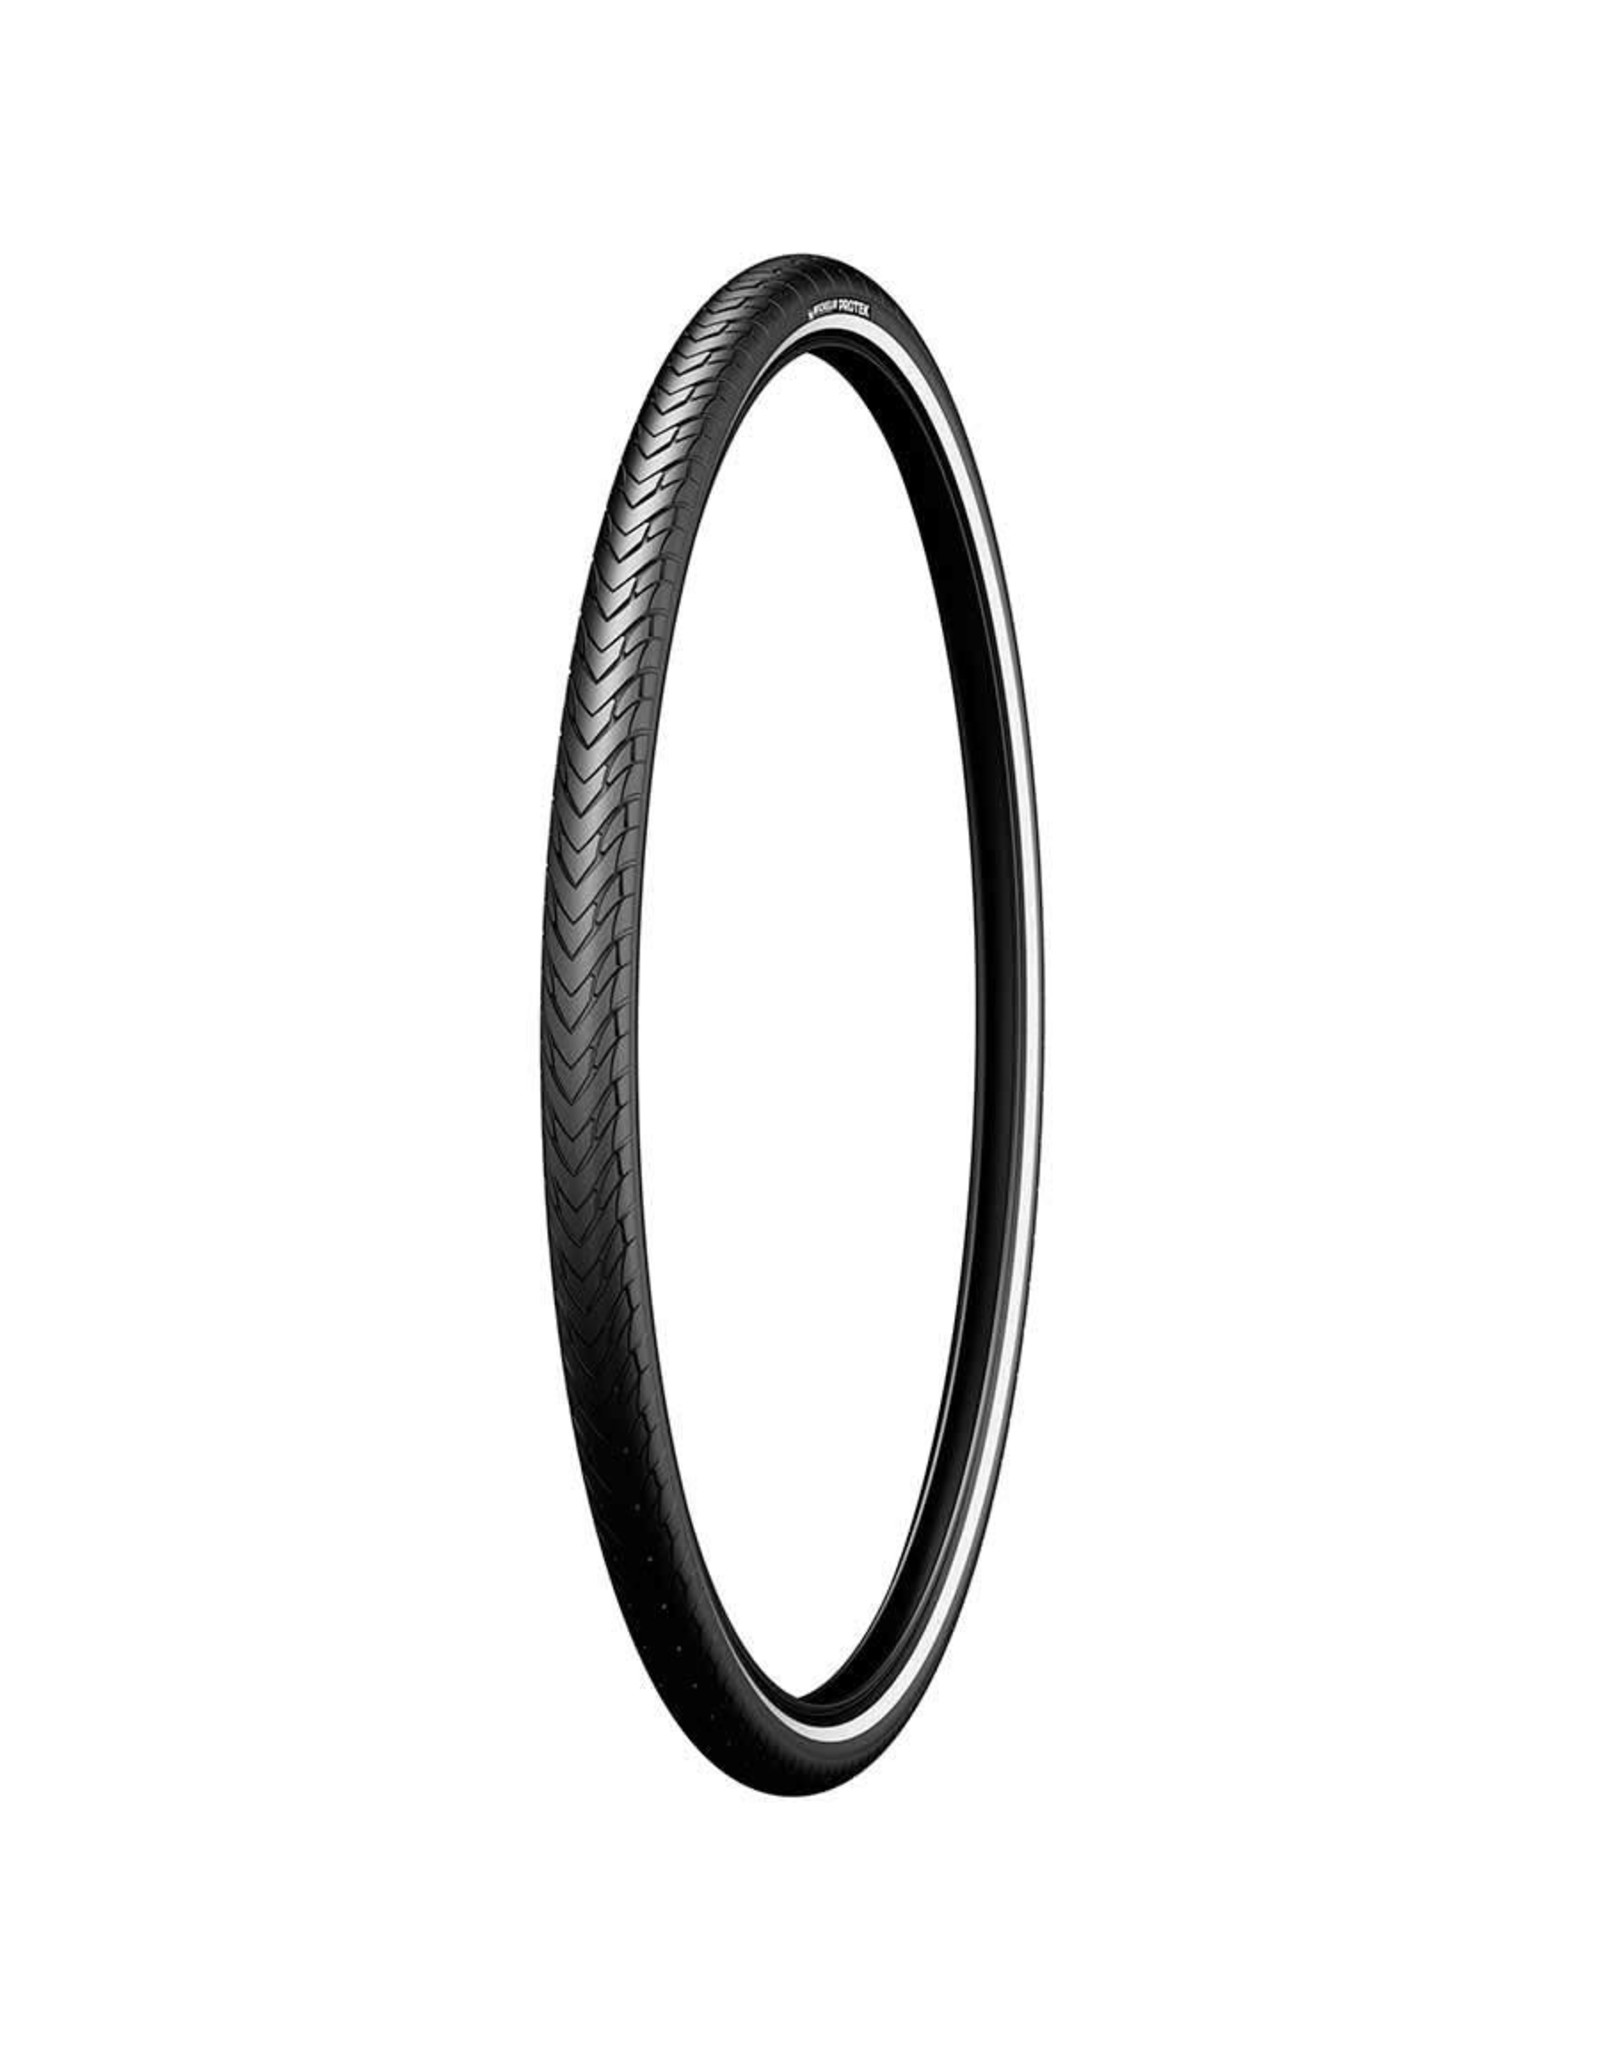 Michelin, Protek, 700x35C